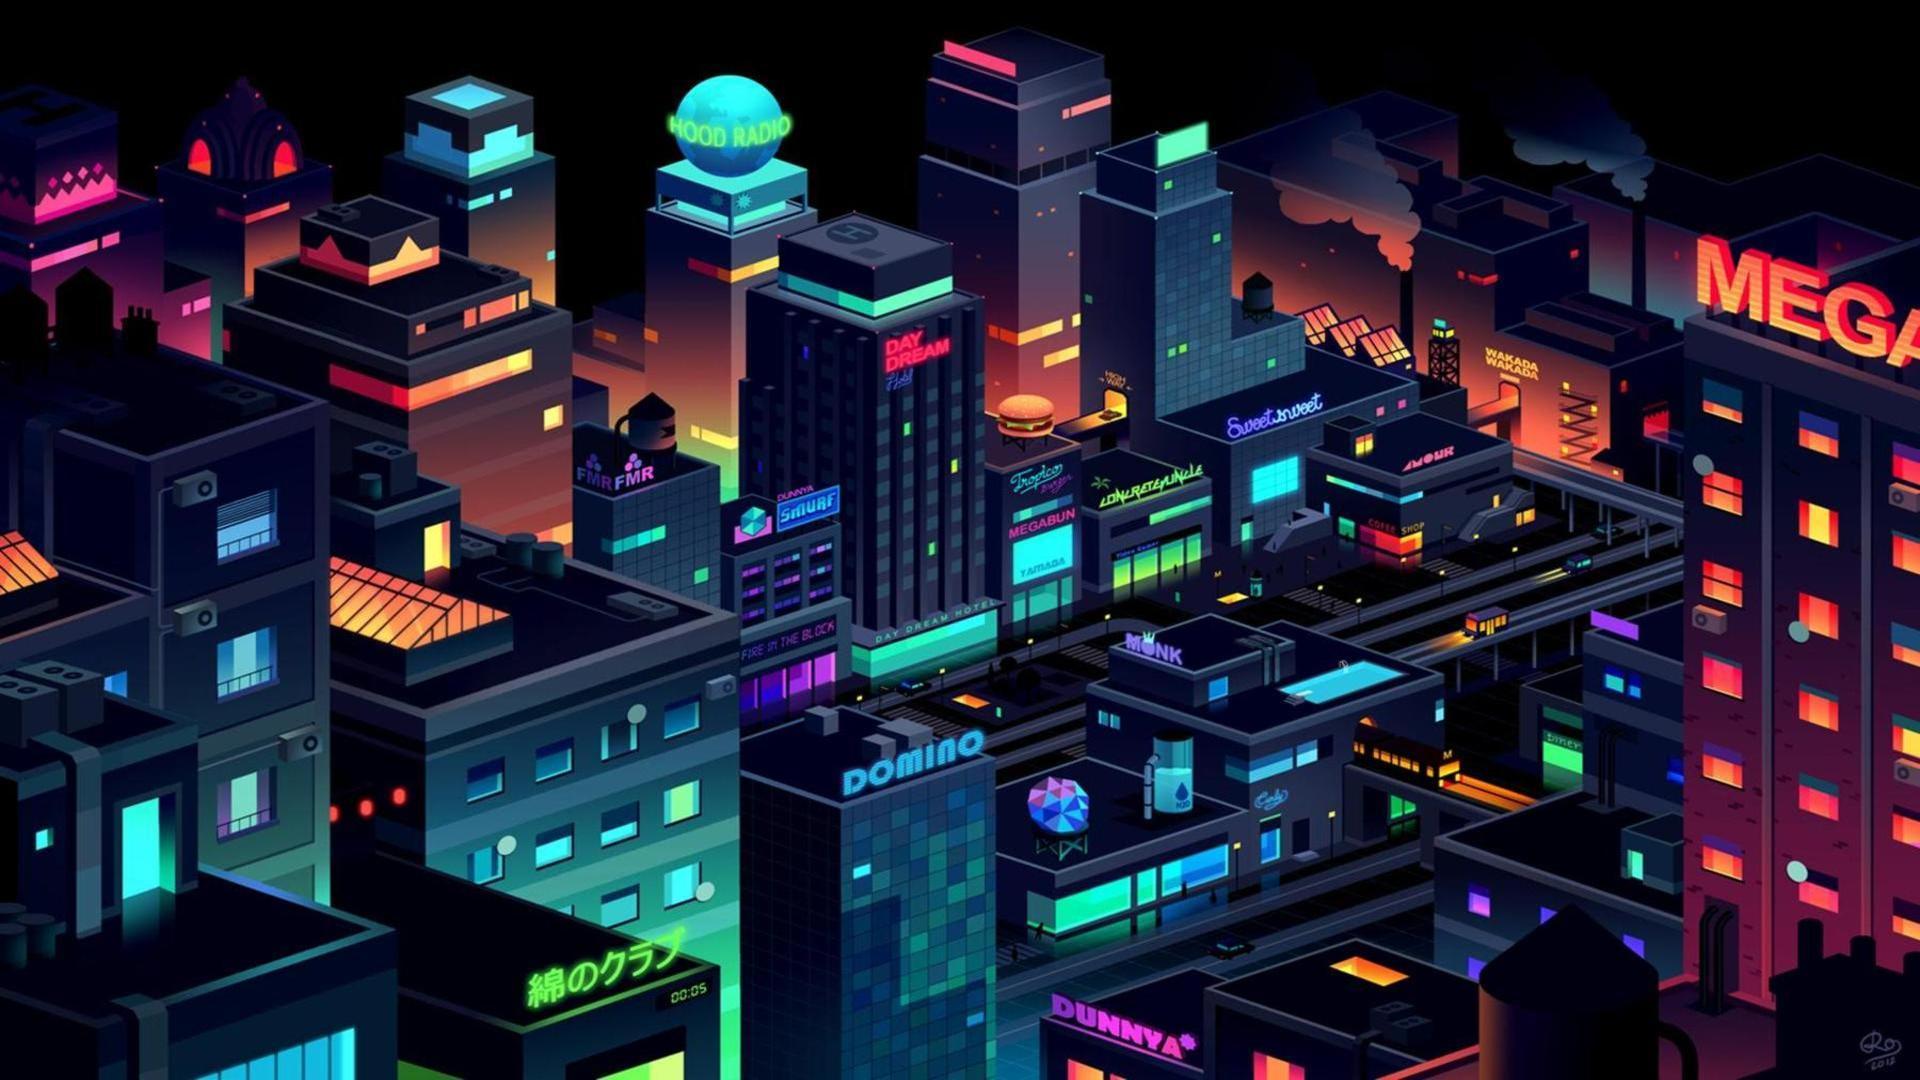 Neon City Wallpapers - Wallpaper Cave